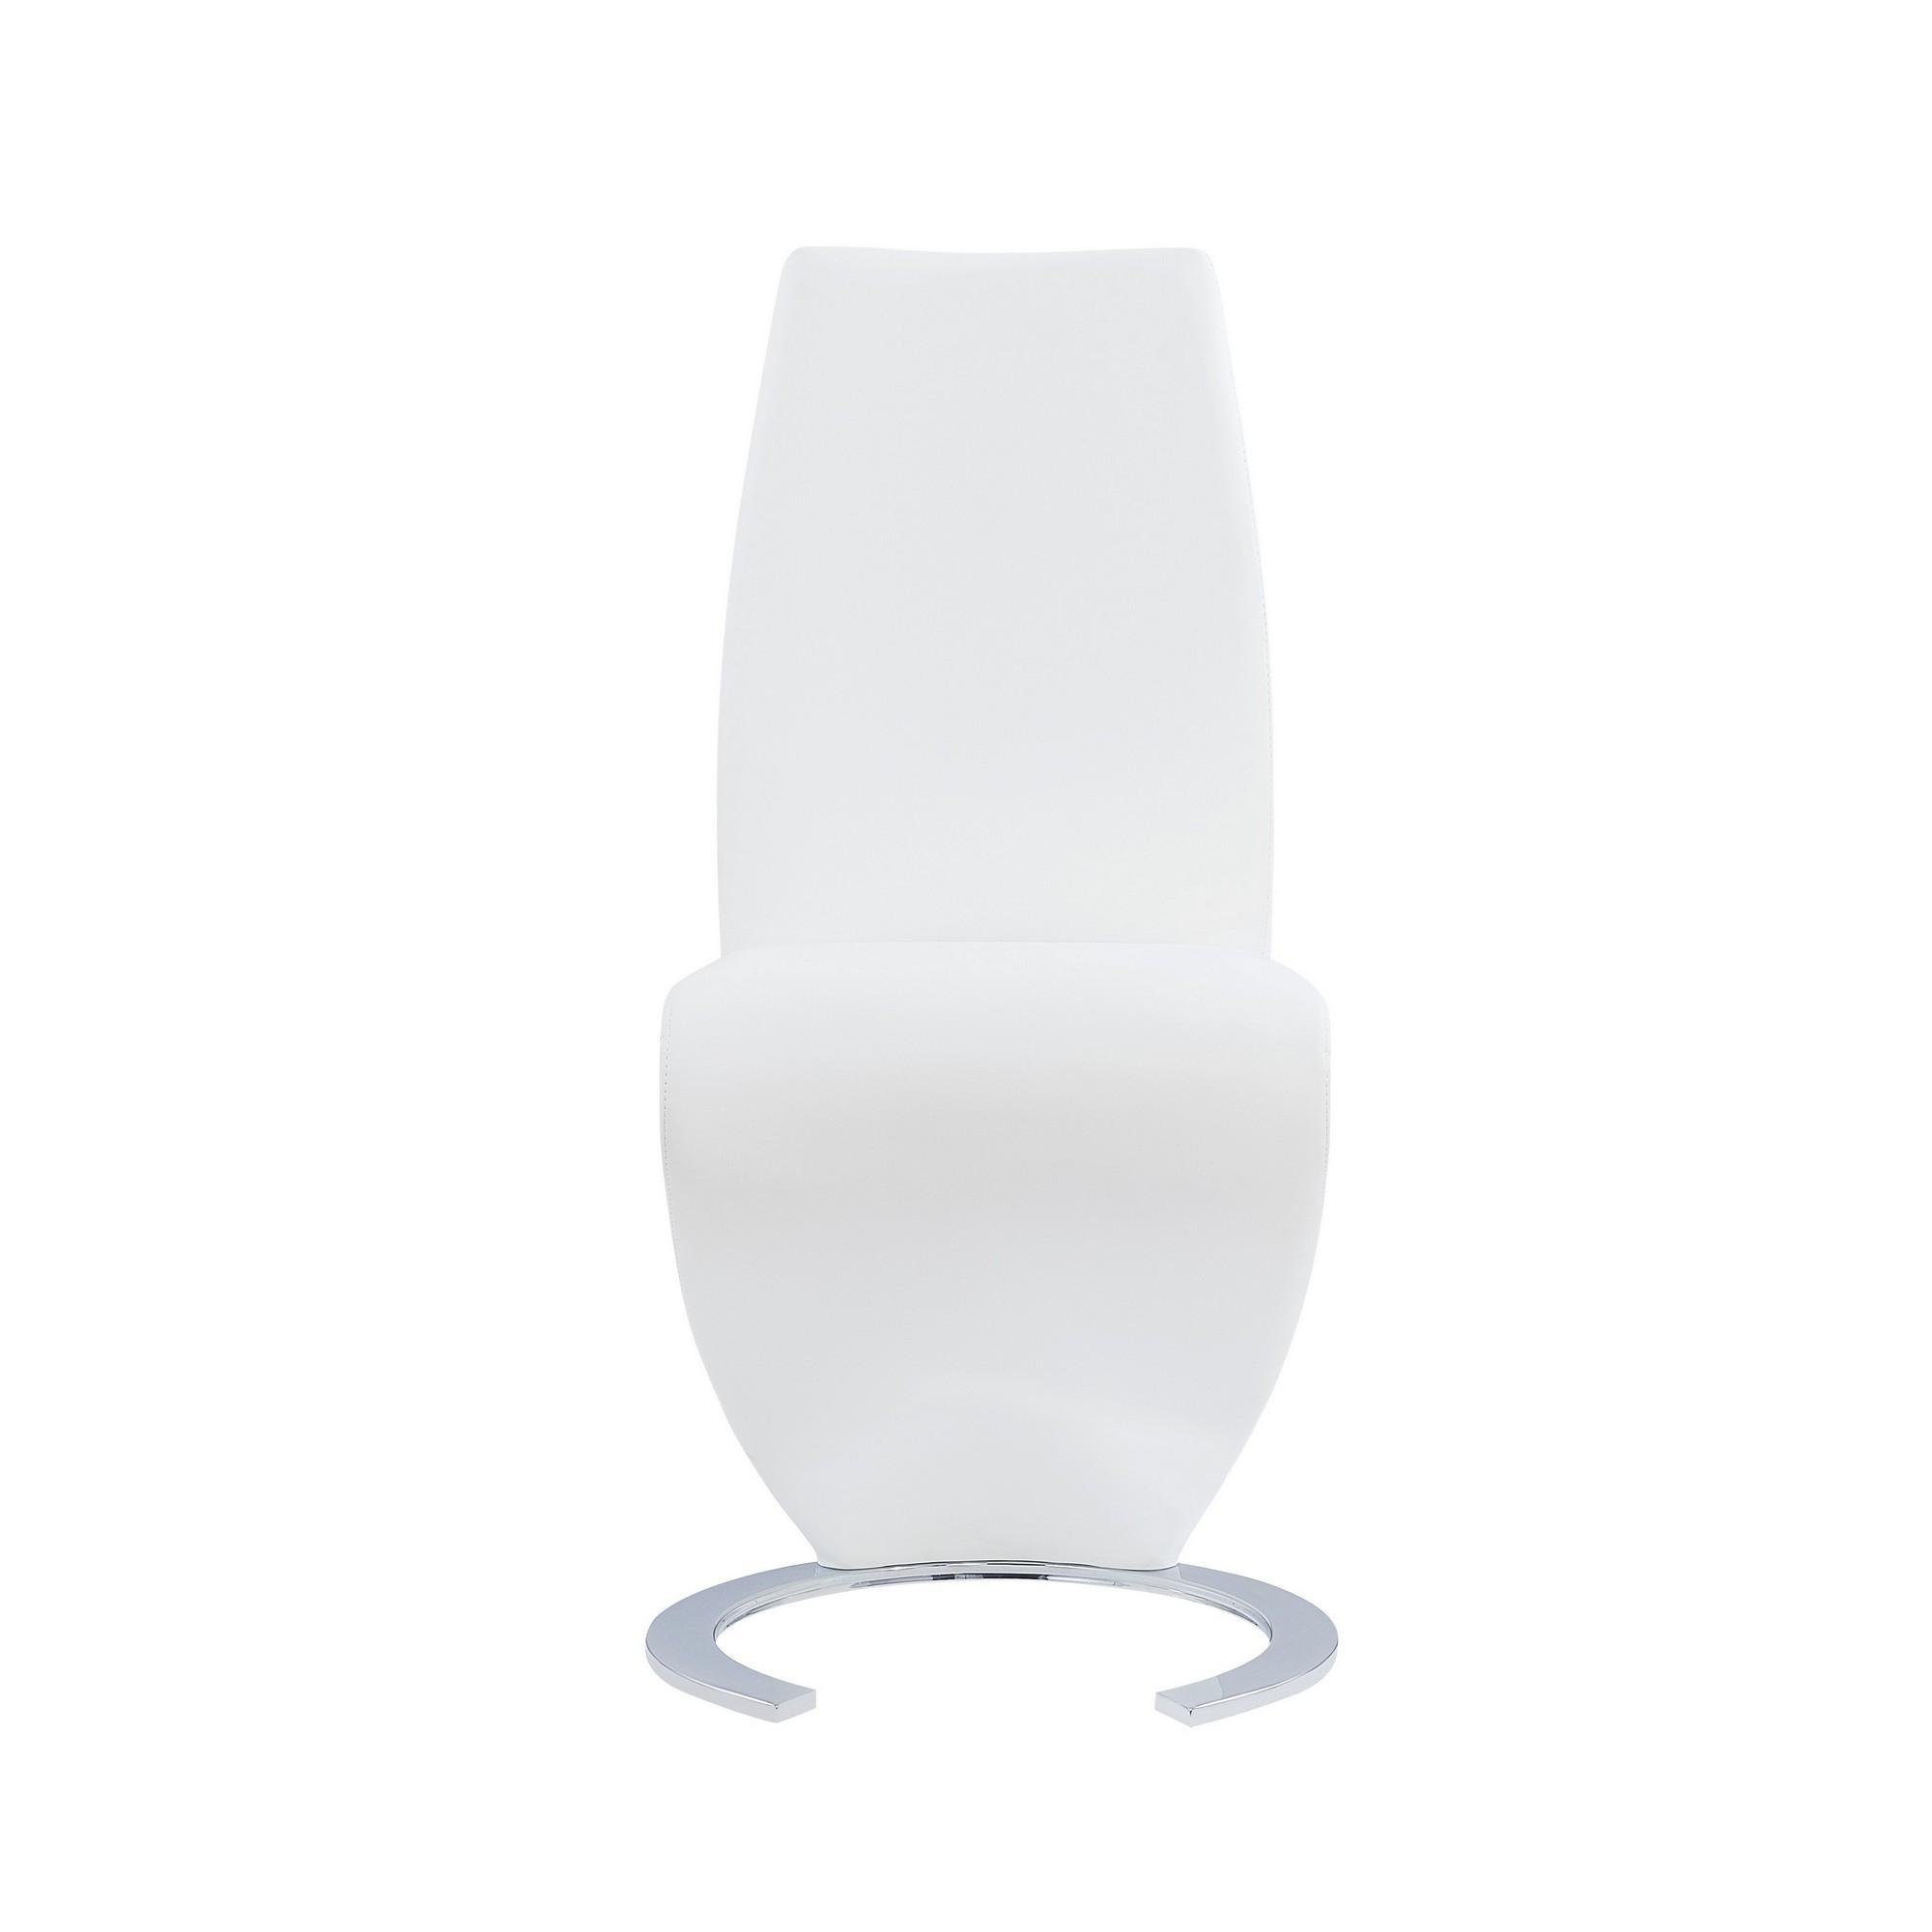 Set of 2 White  Z Shape design Dining Chairs with Horse Shoe Shape Base